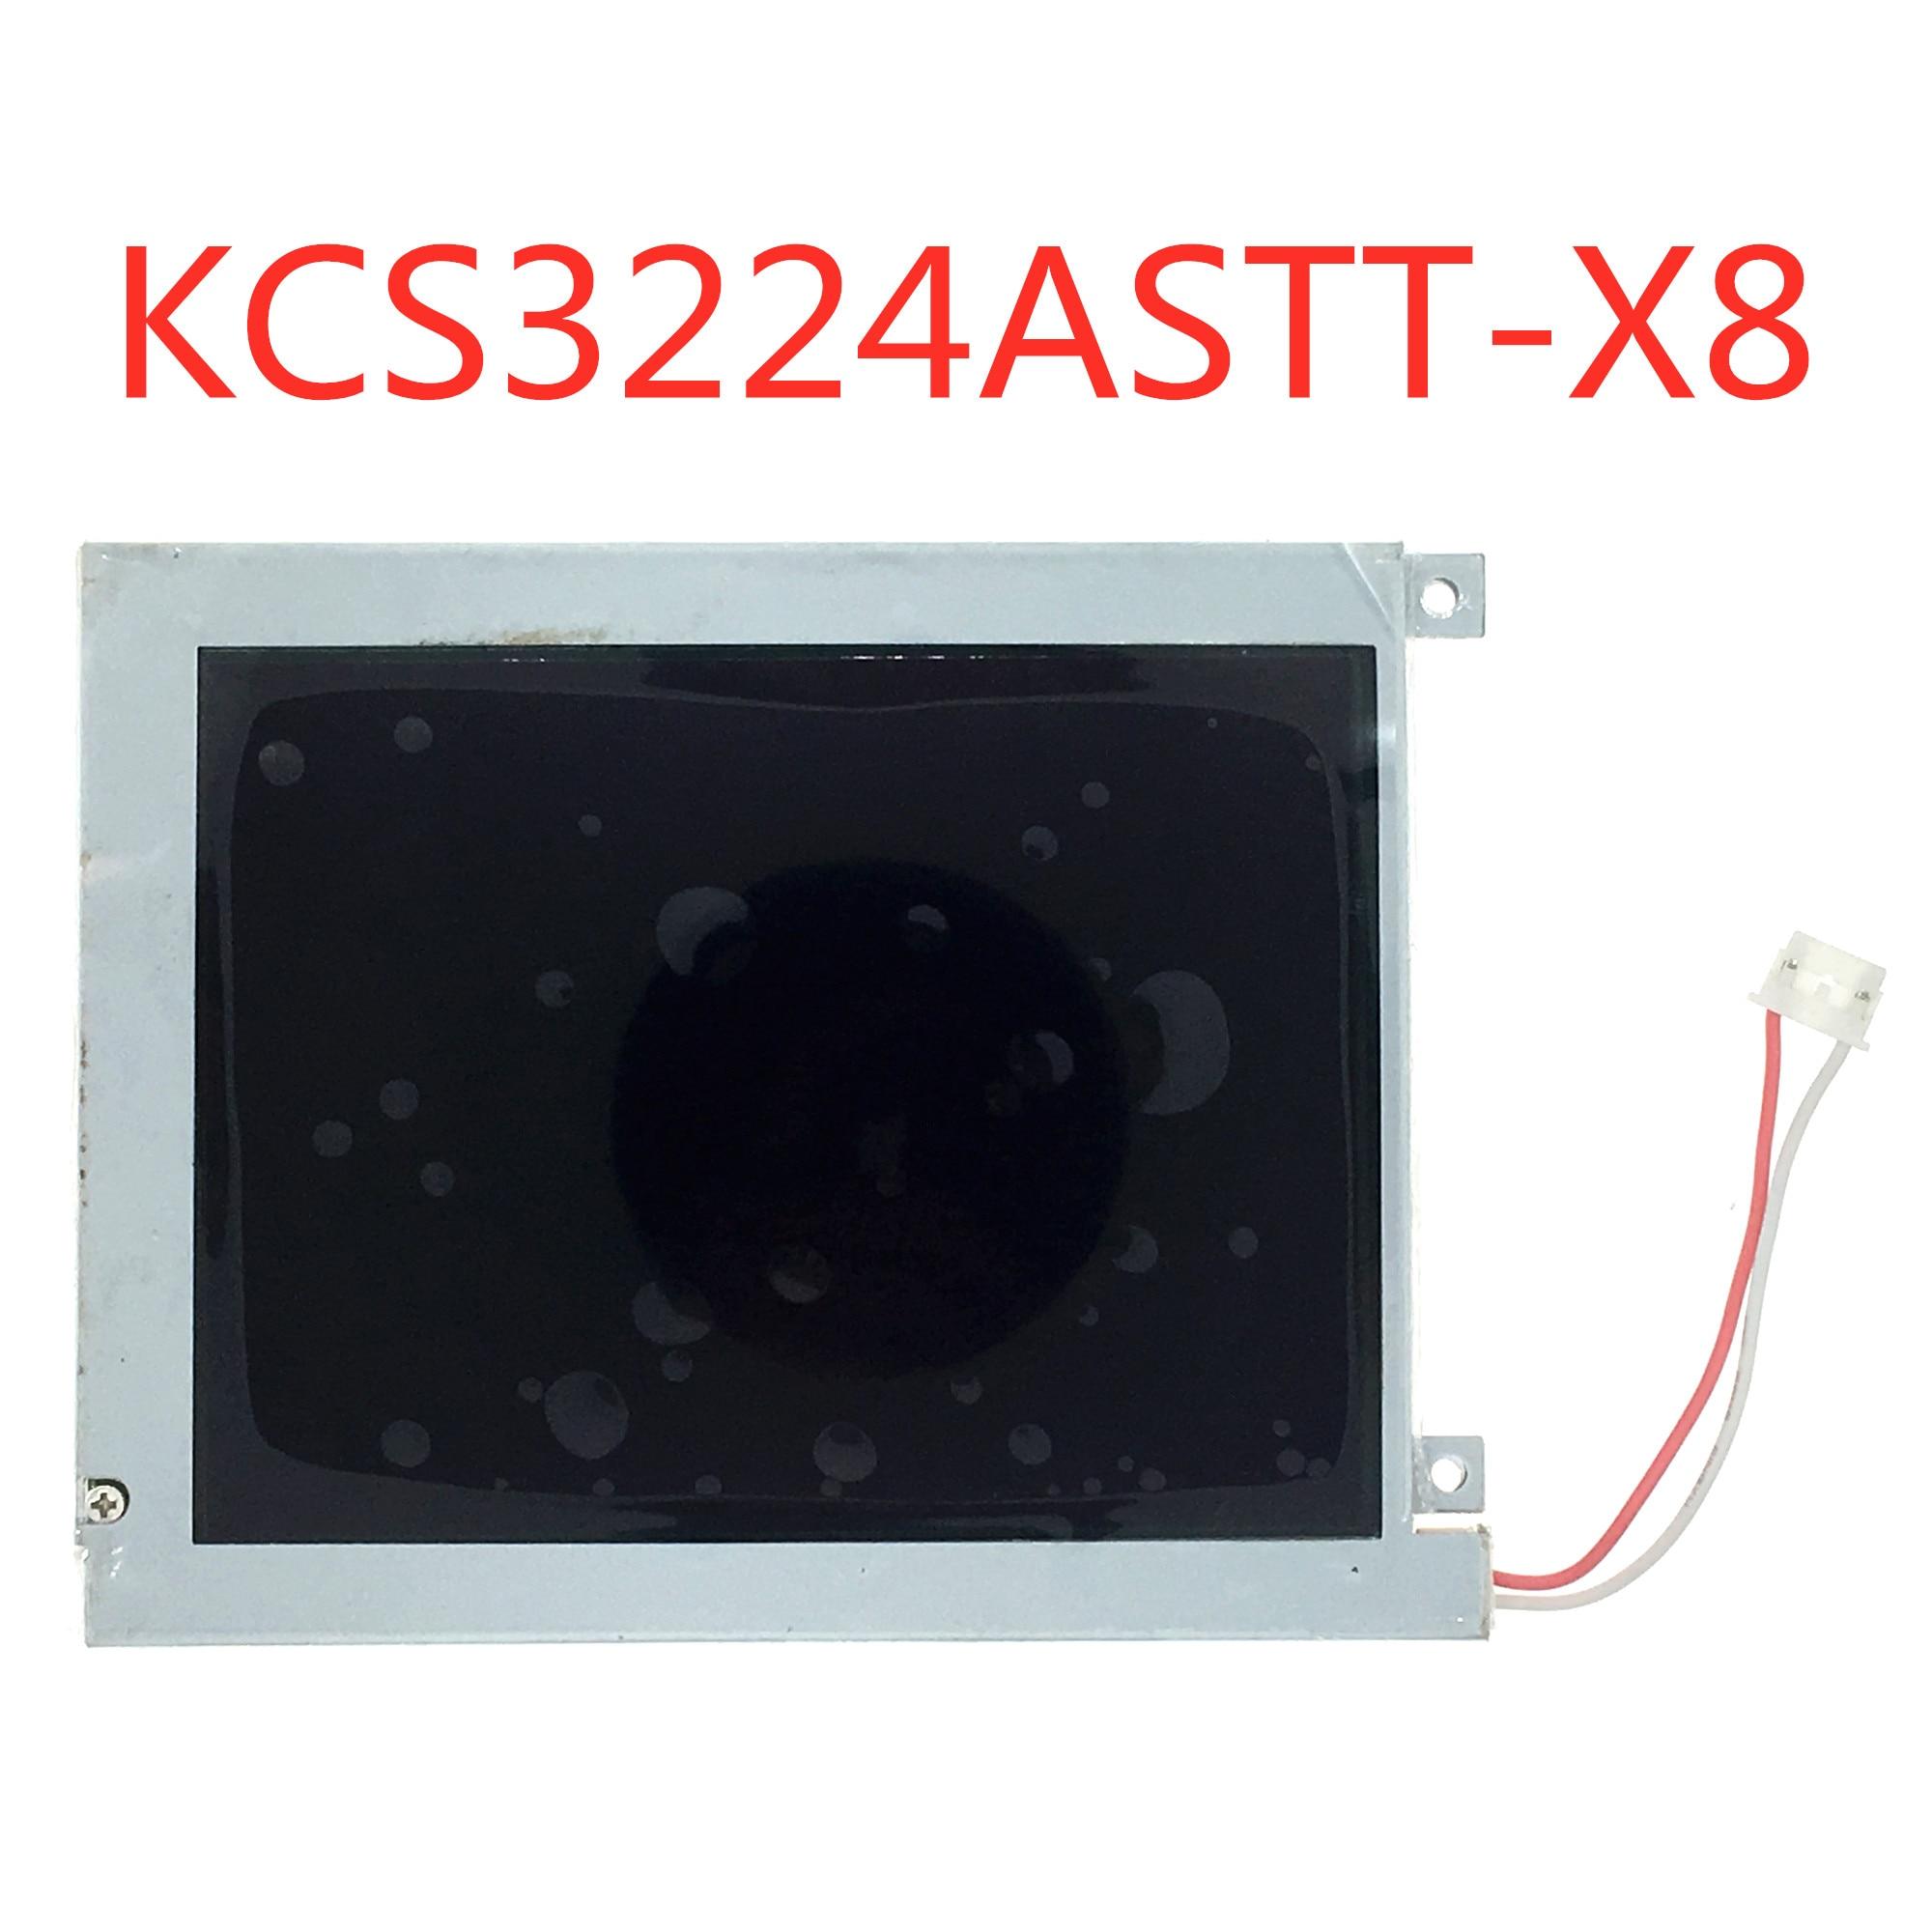 Details about  /LCD KCS3224ASTT-X8-4Y-01 90 days warranty